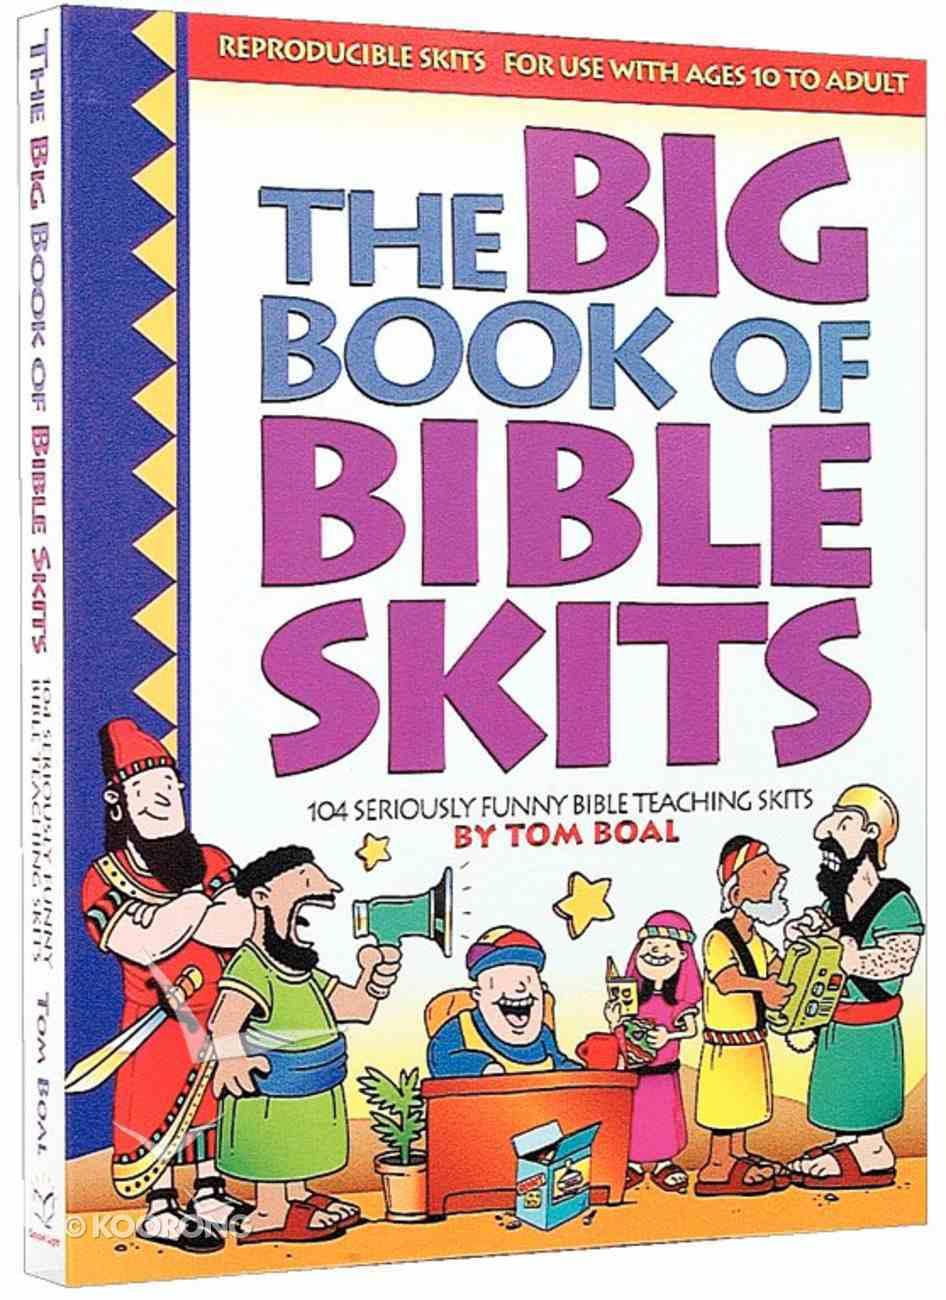 The Big Book of Bible Skits Paperback